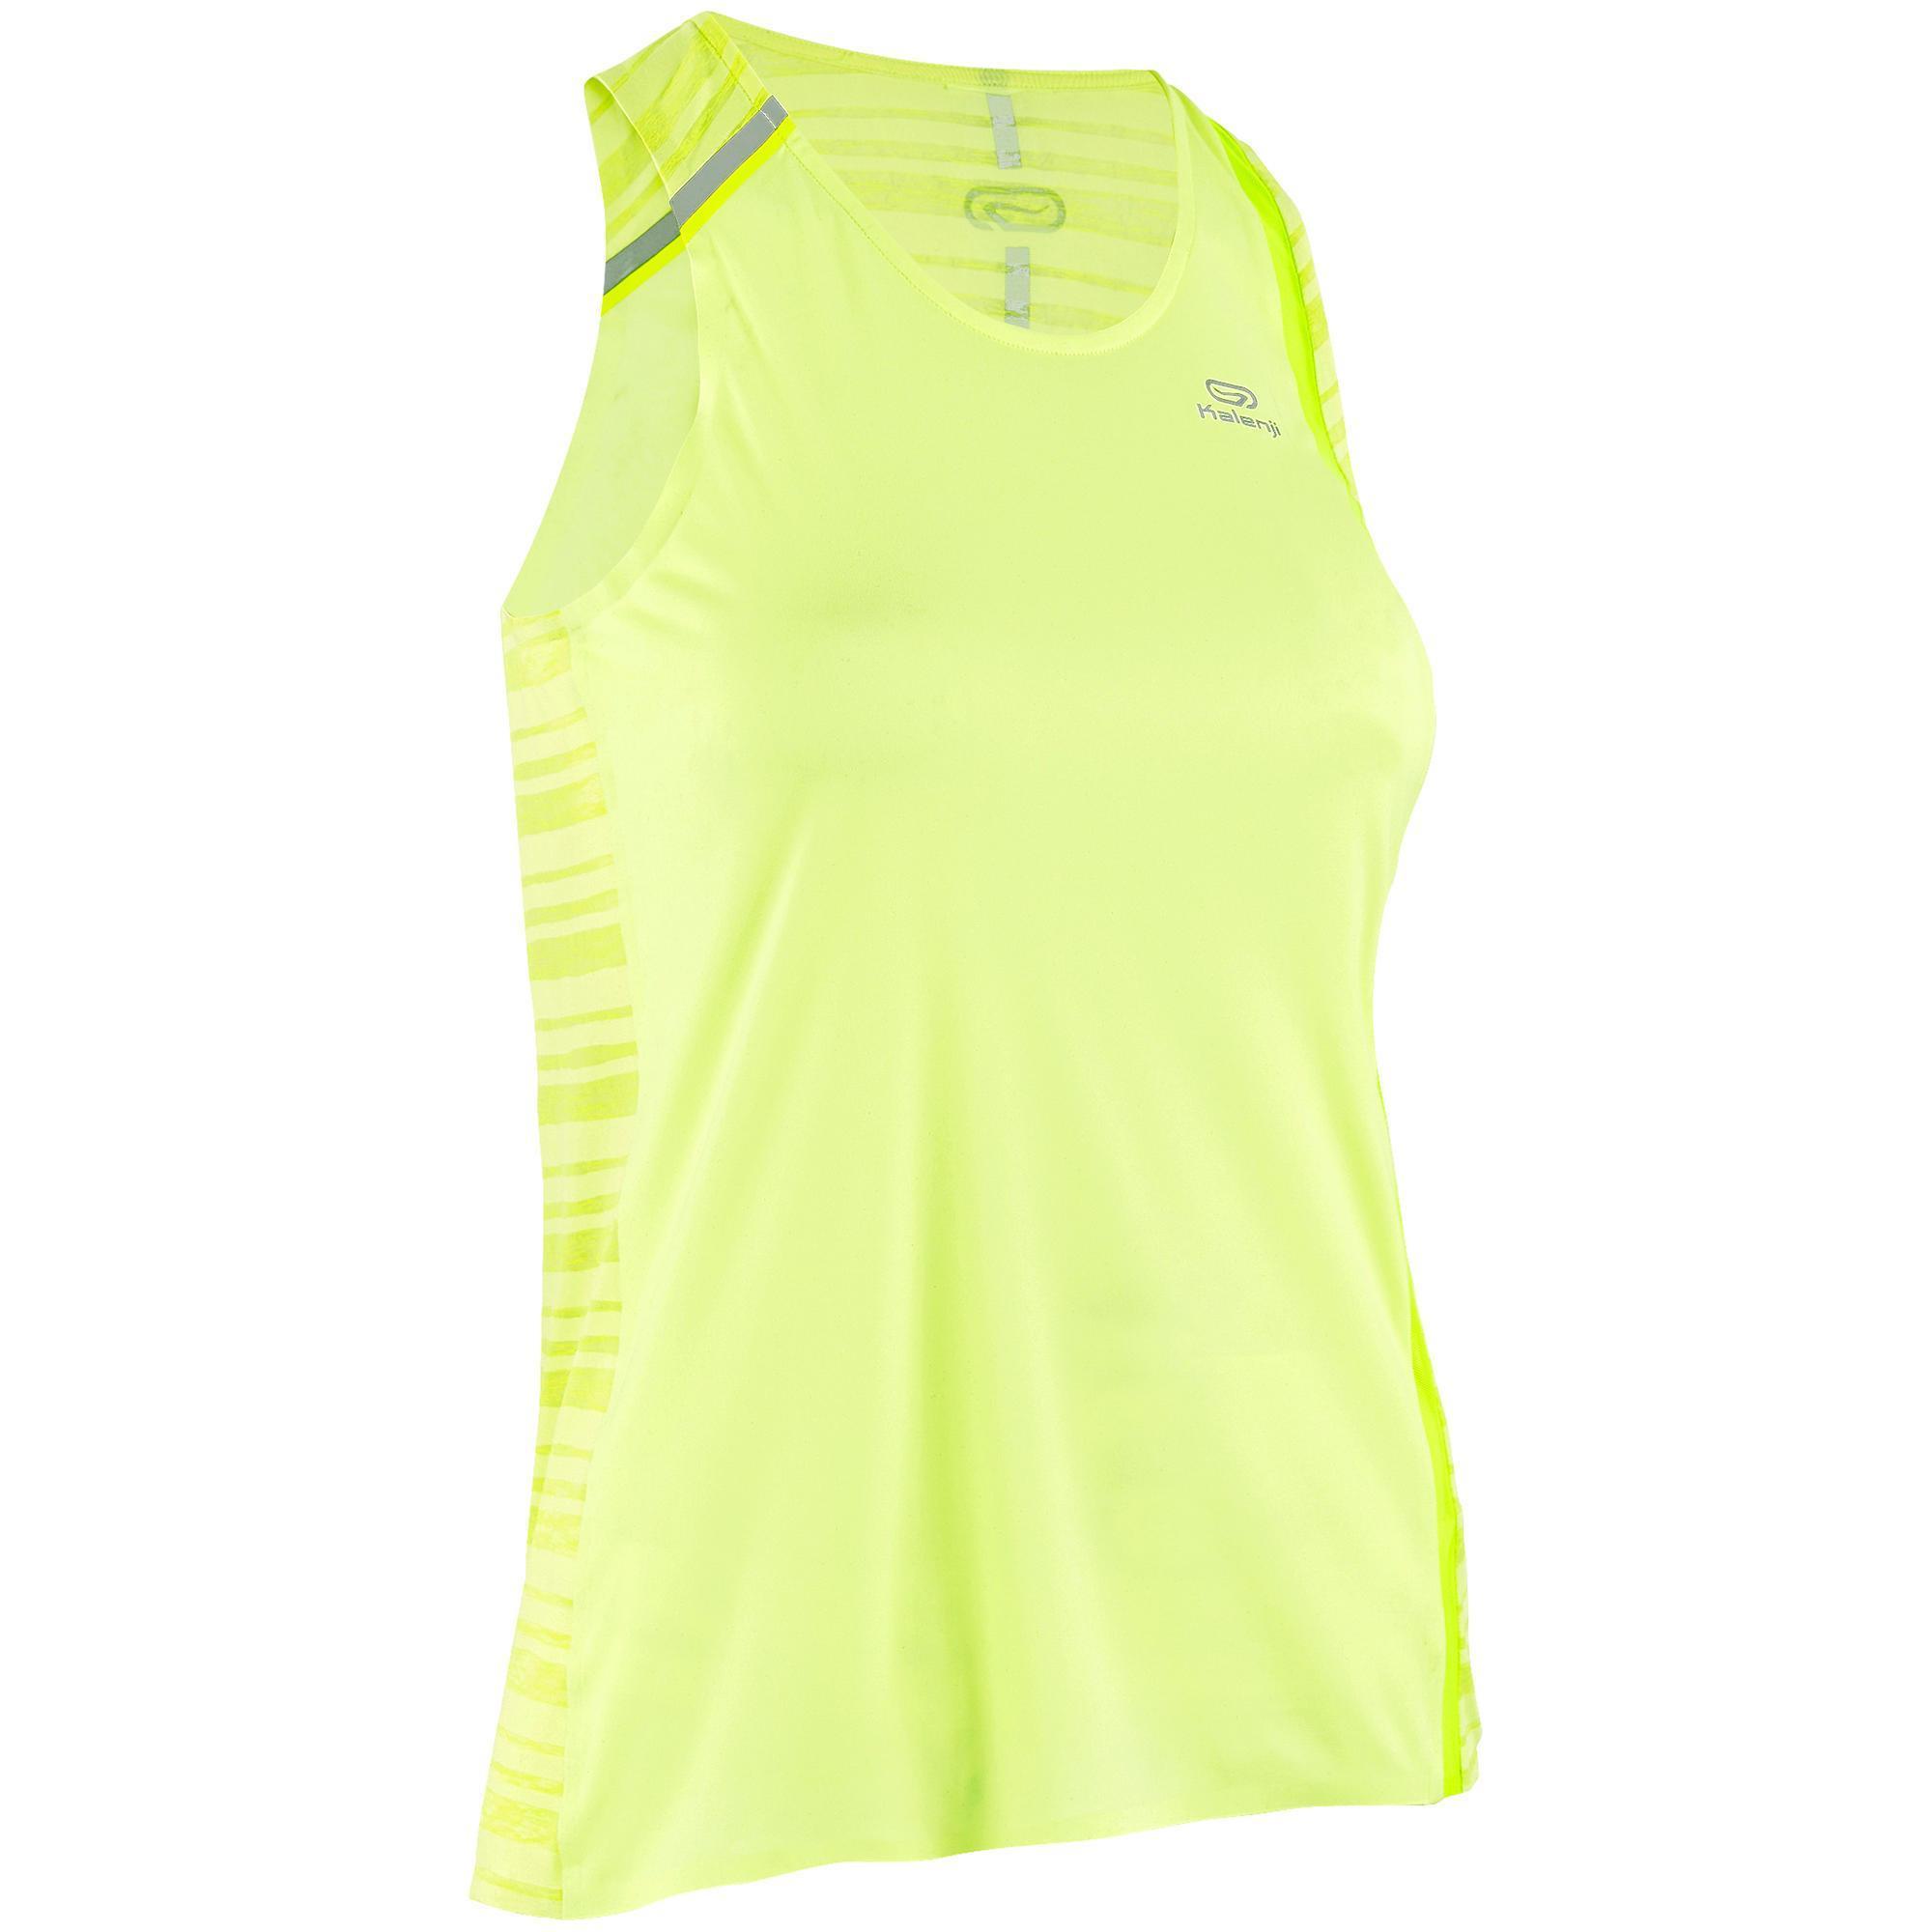 Lauftop Kiprun Light Damen gelb | Sportbekleidung > Sporttops > Lauftops | Kalenji